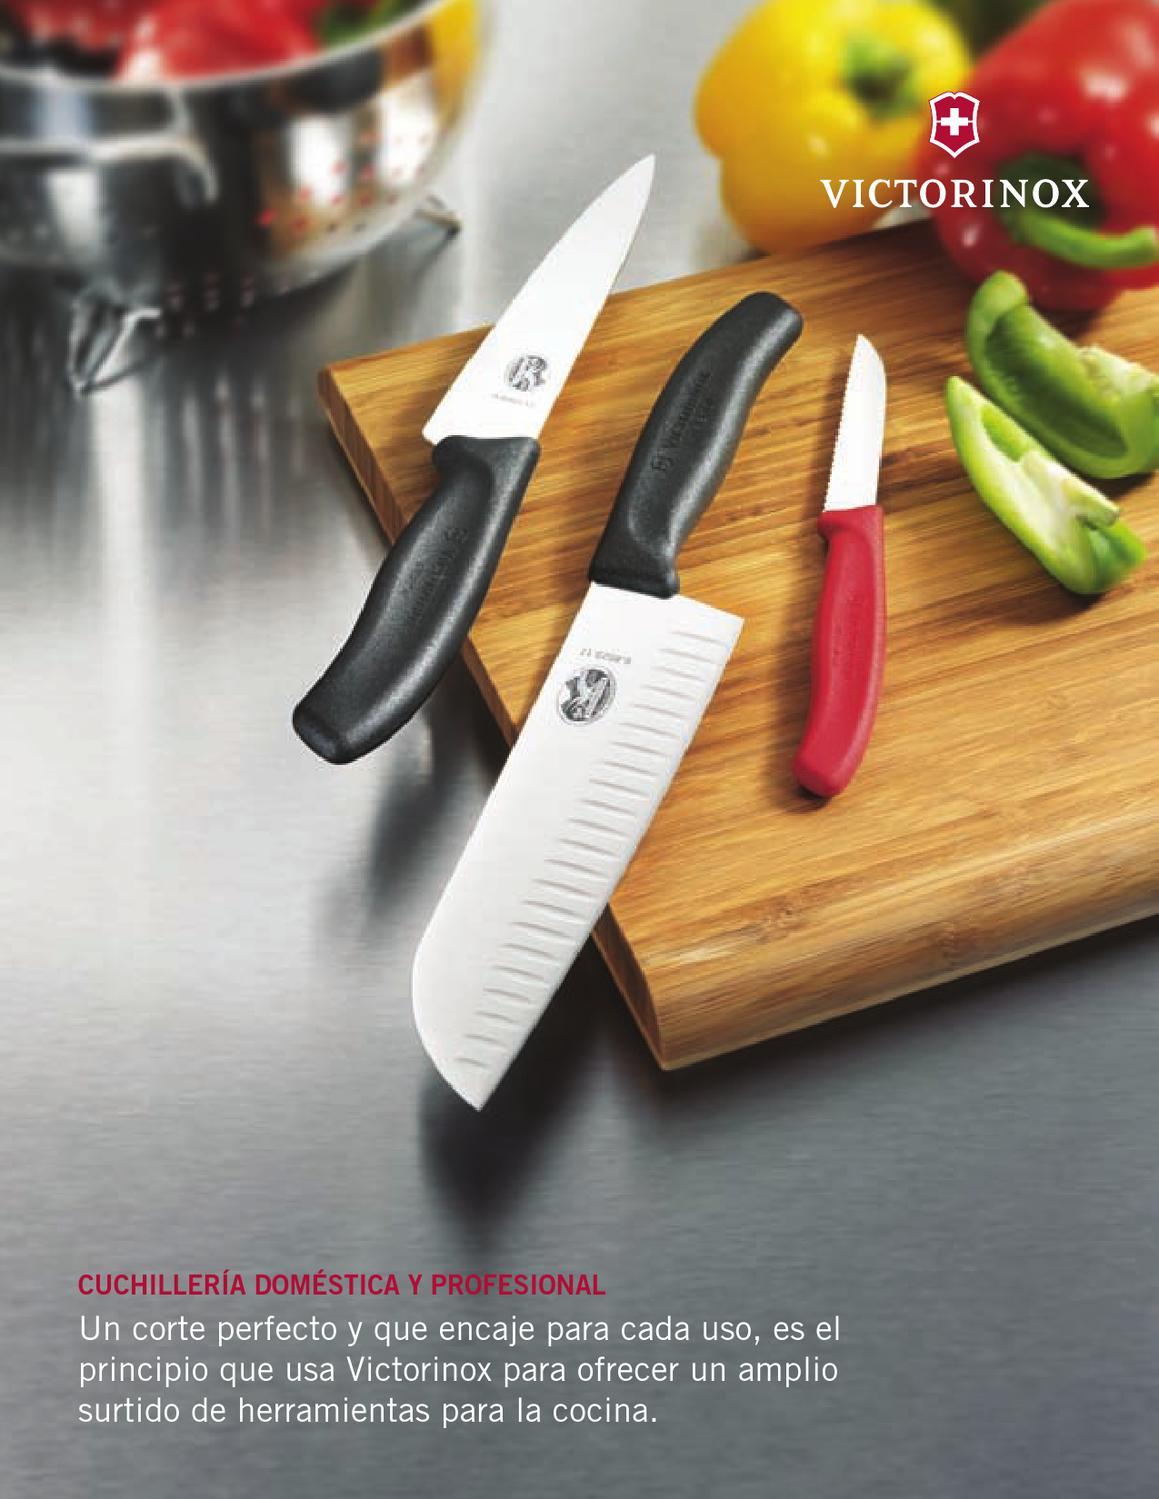 Cuchiller a y cocina cat logo digital by matesa issuu for Cuchilleria profesional cocina